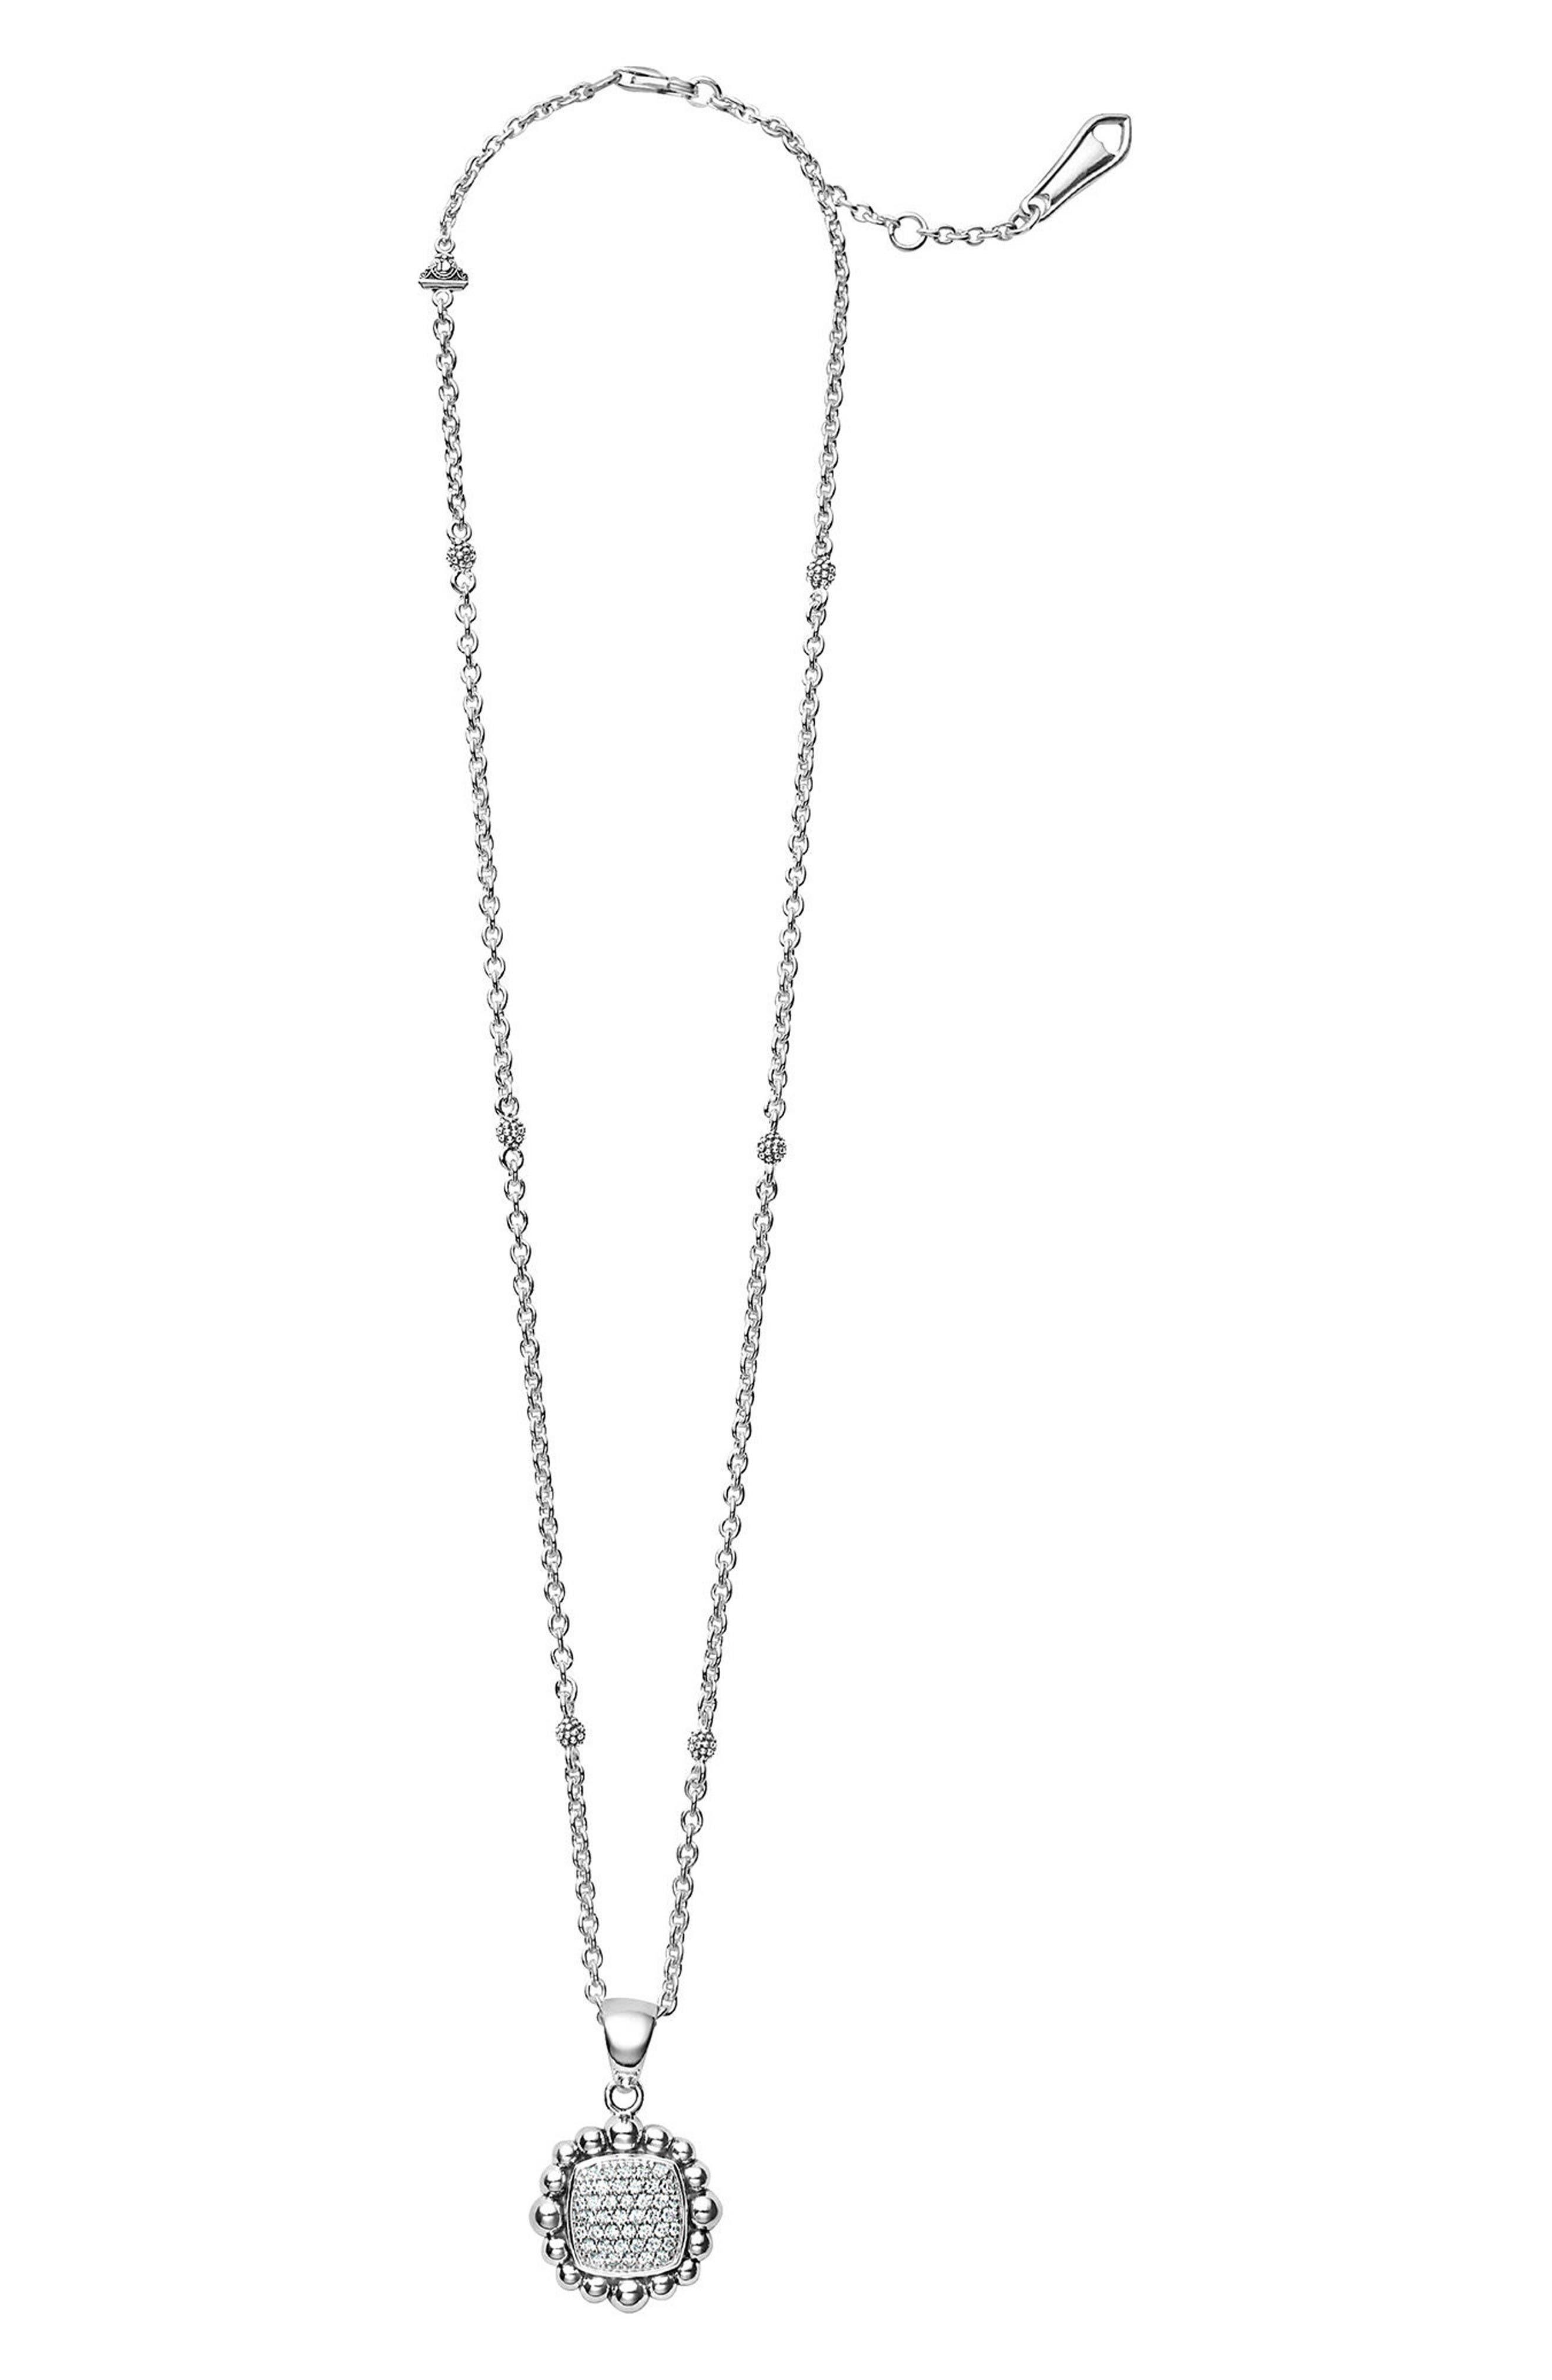 Caviar Spark Square Diamond Pendant Necklace,                         Main,                         color, Silver